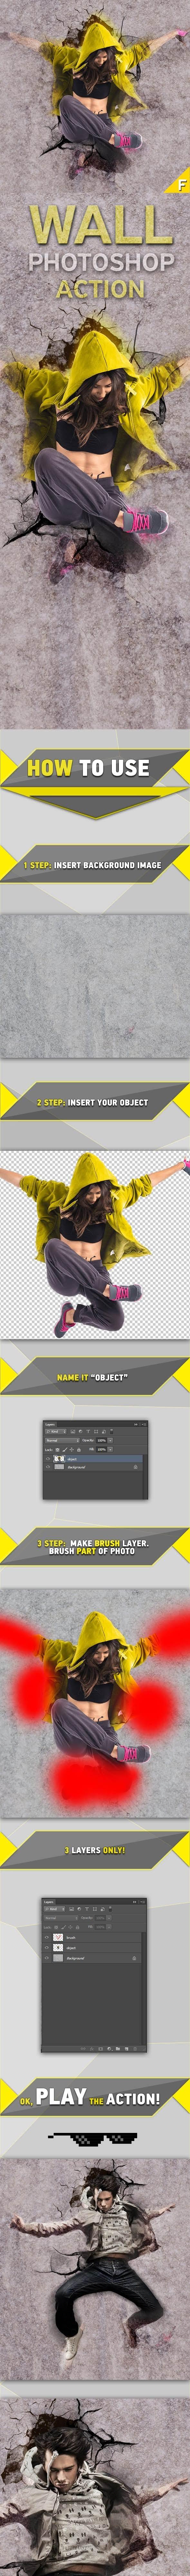 Wall Photoshop Action 16010570 – Sourcepsd com